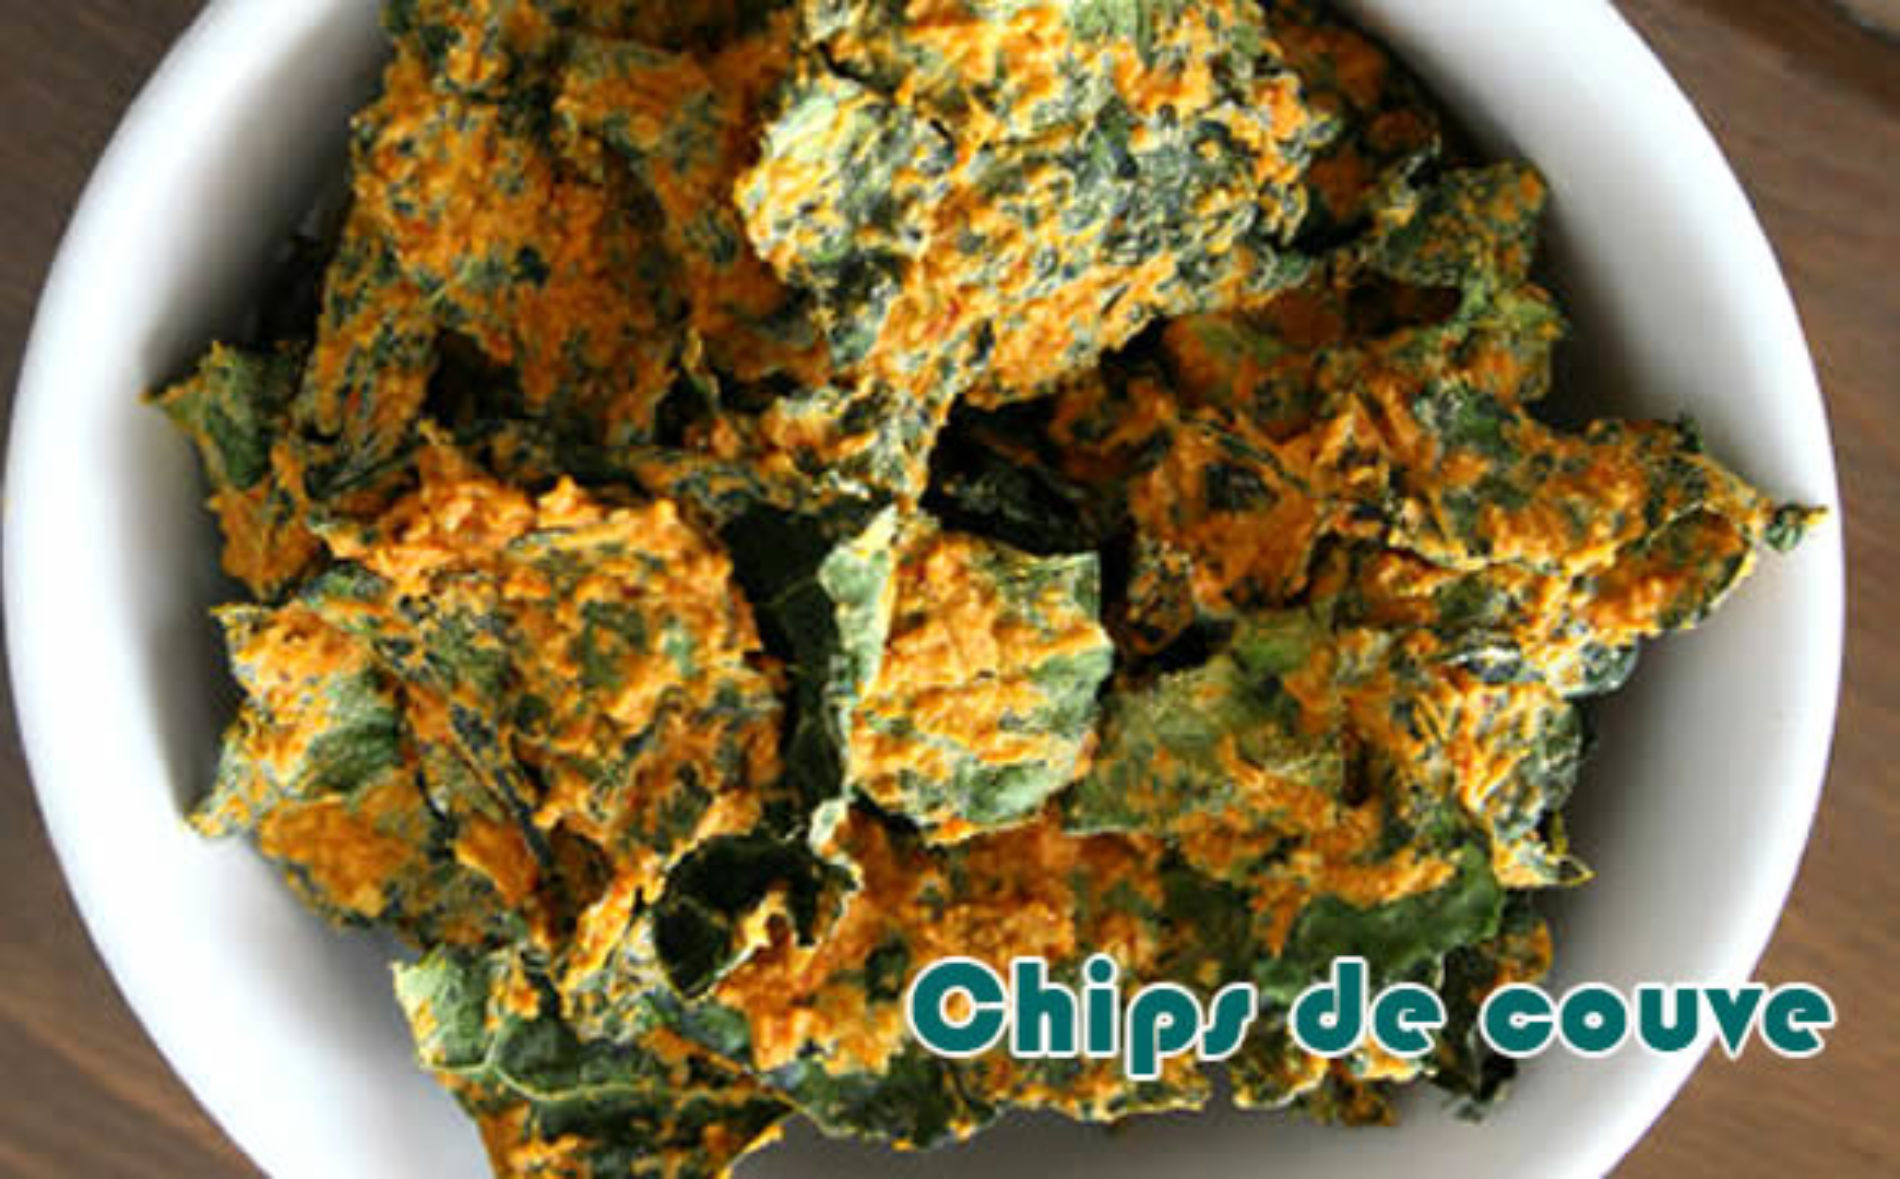 Salgadinho chips de couve – Receitas fit